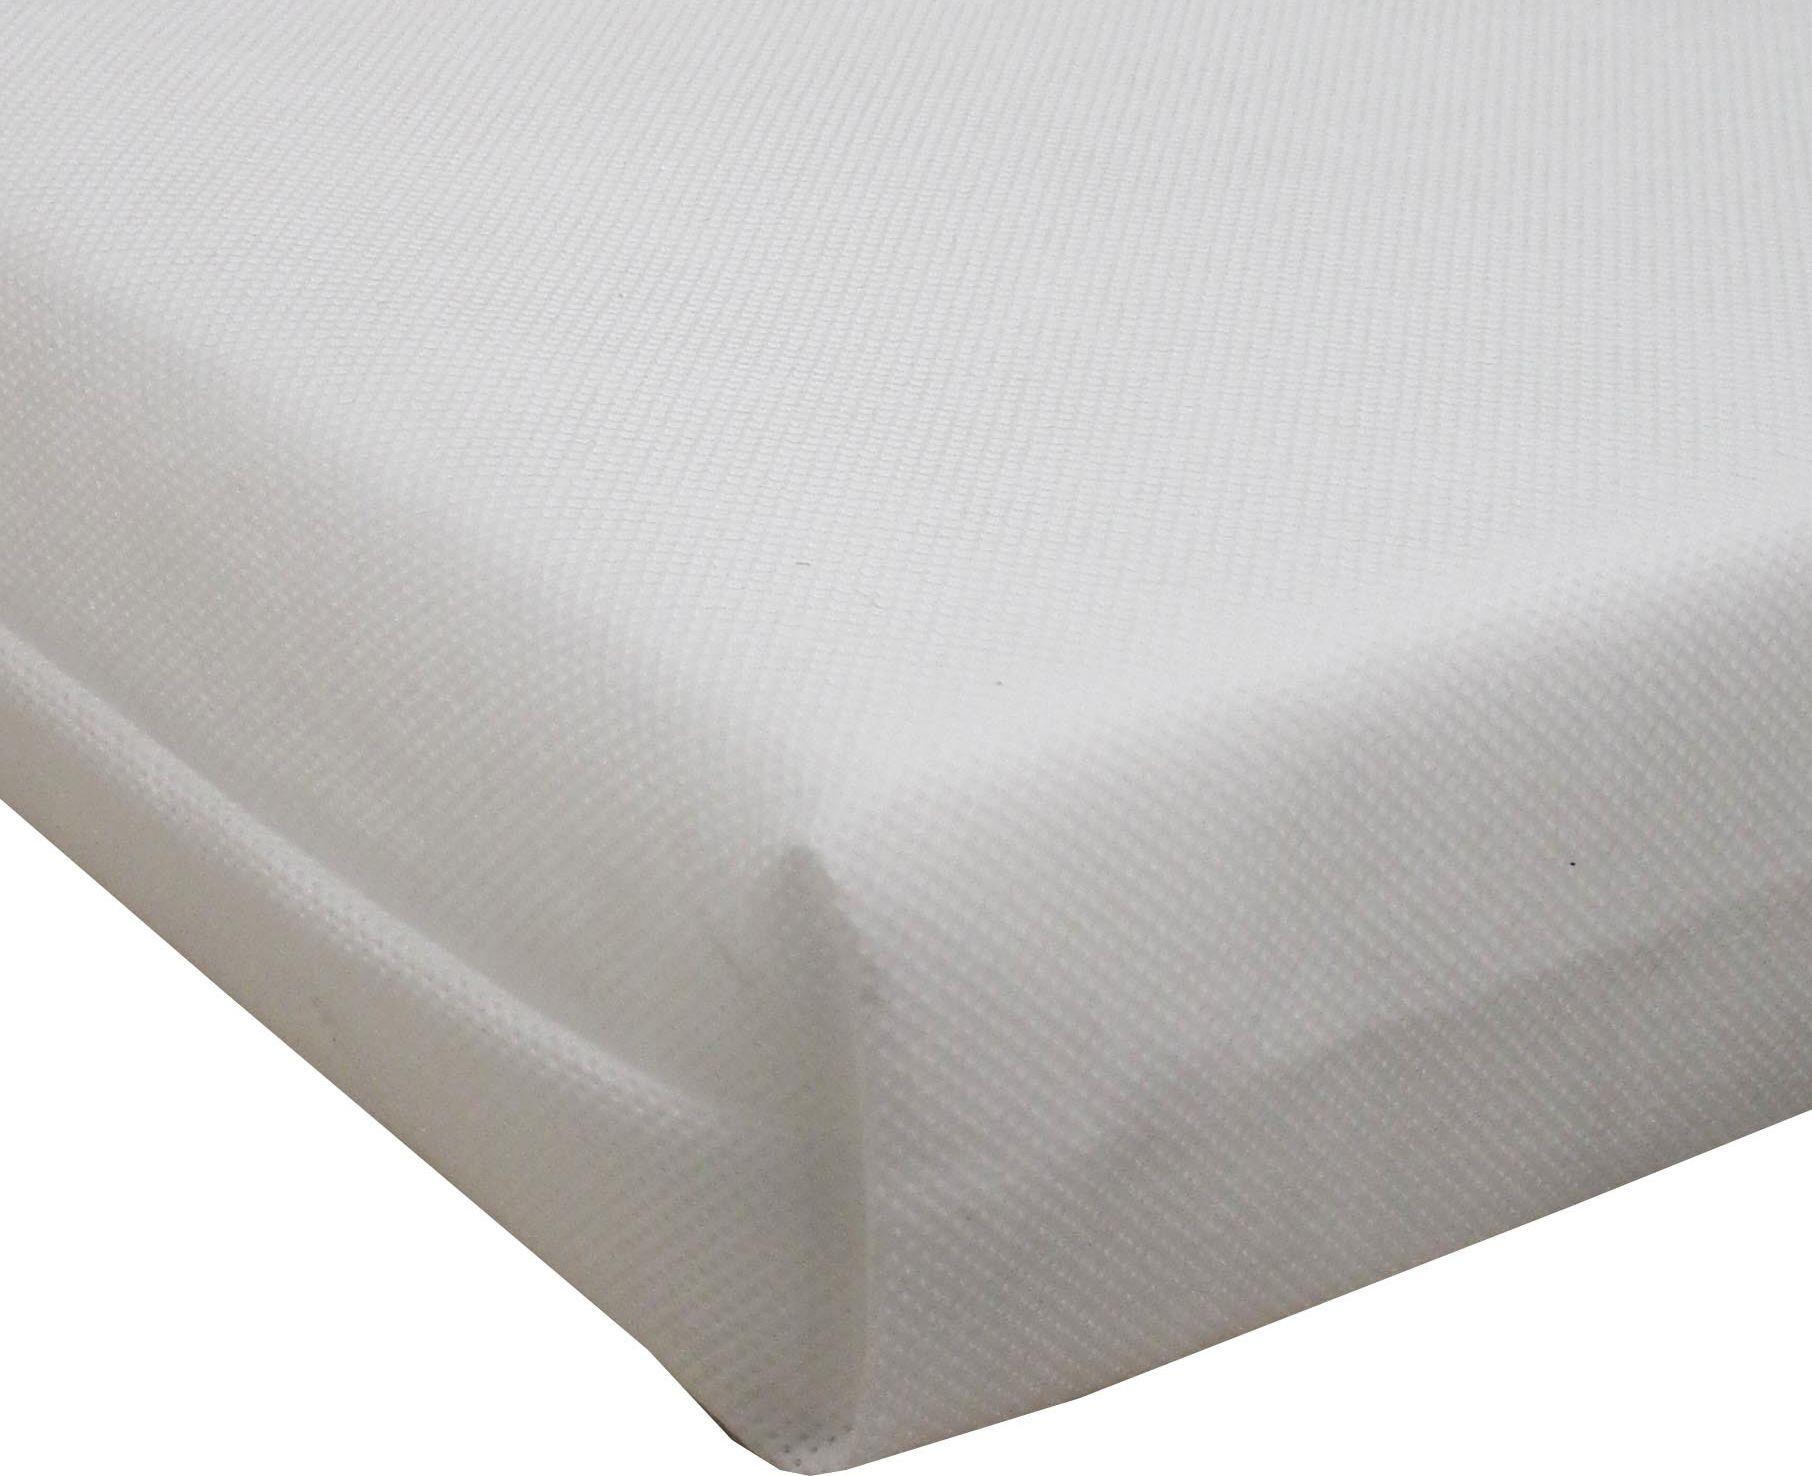 kub calm mattress  70 x 140cm.